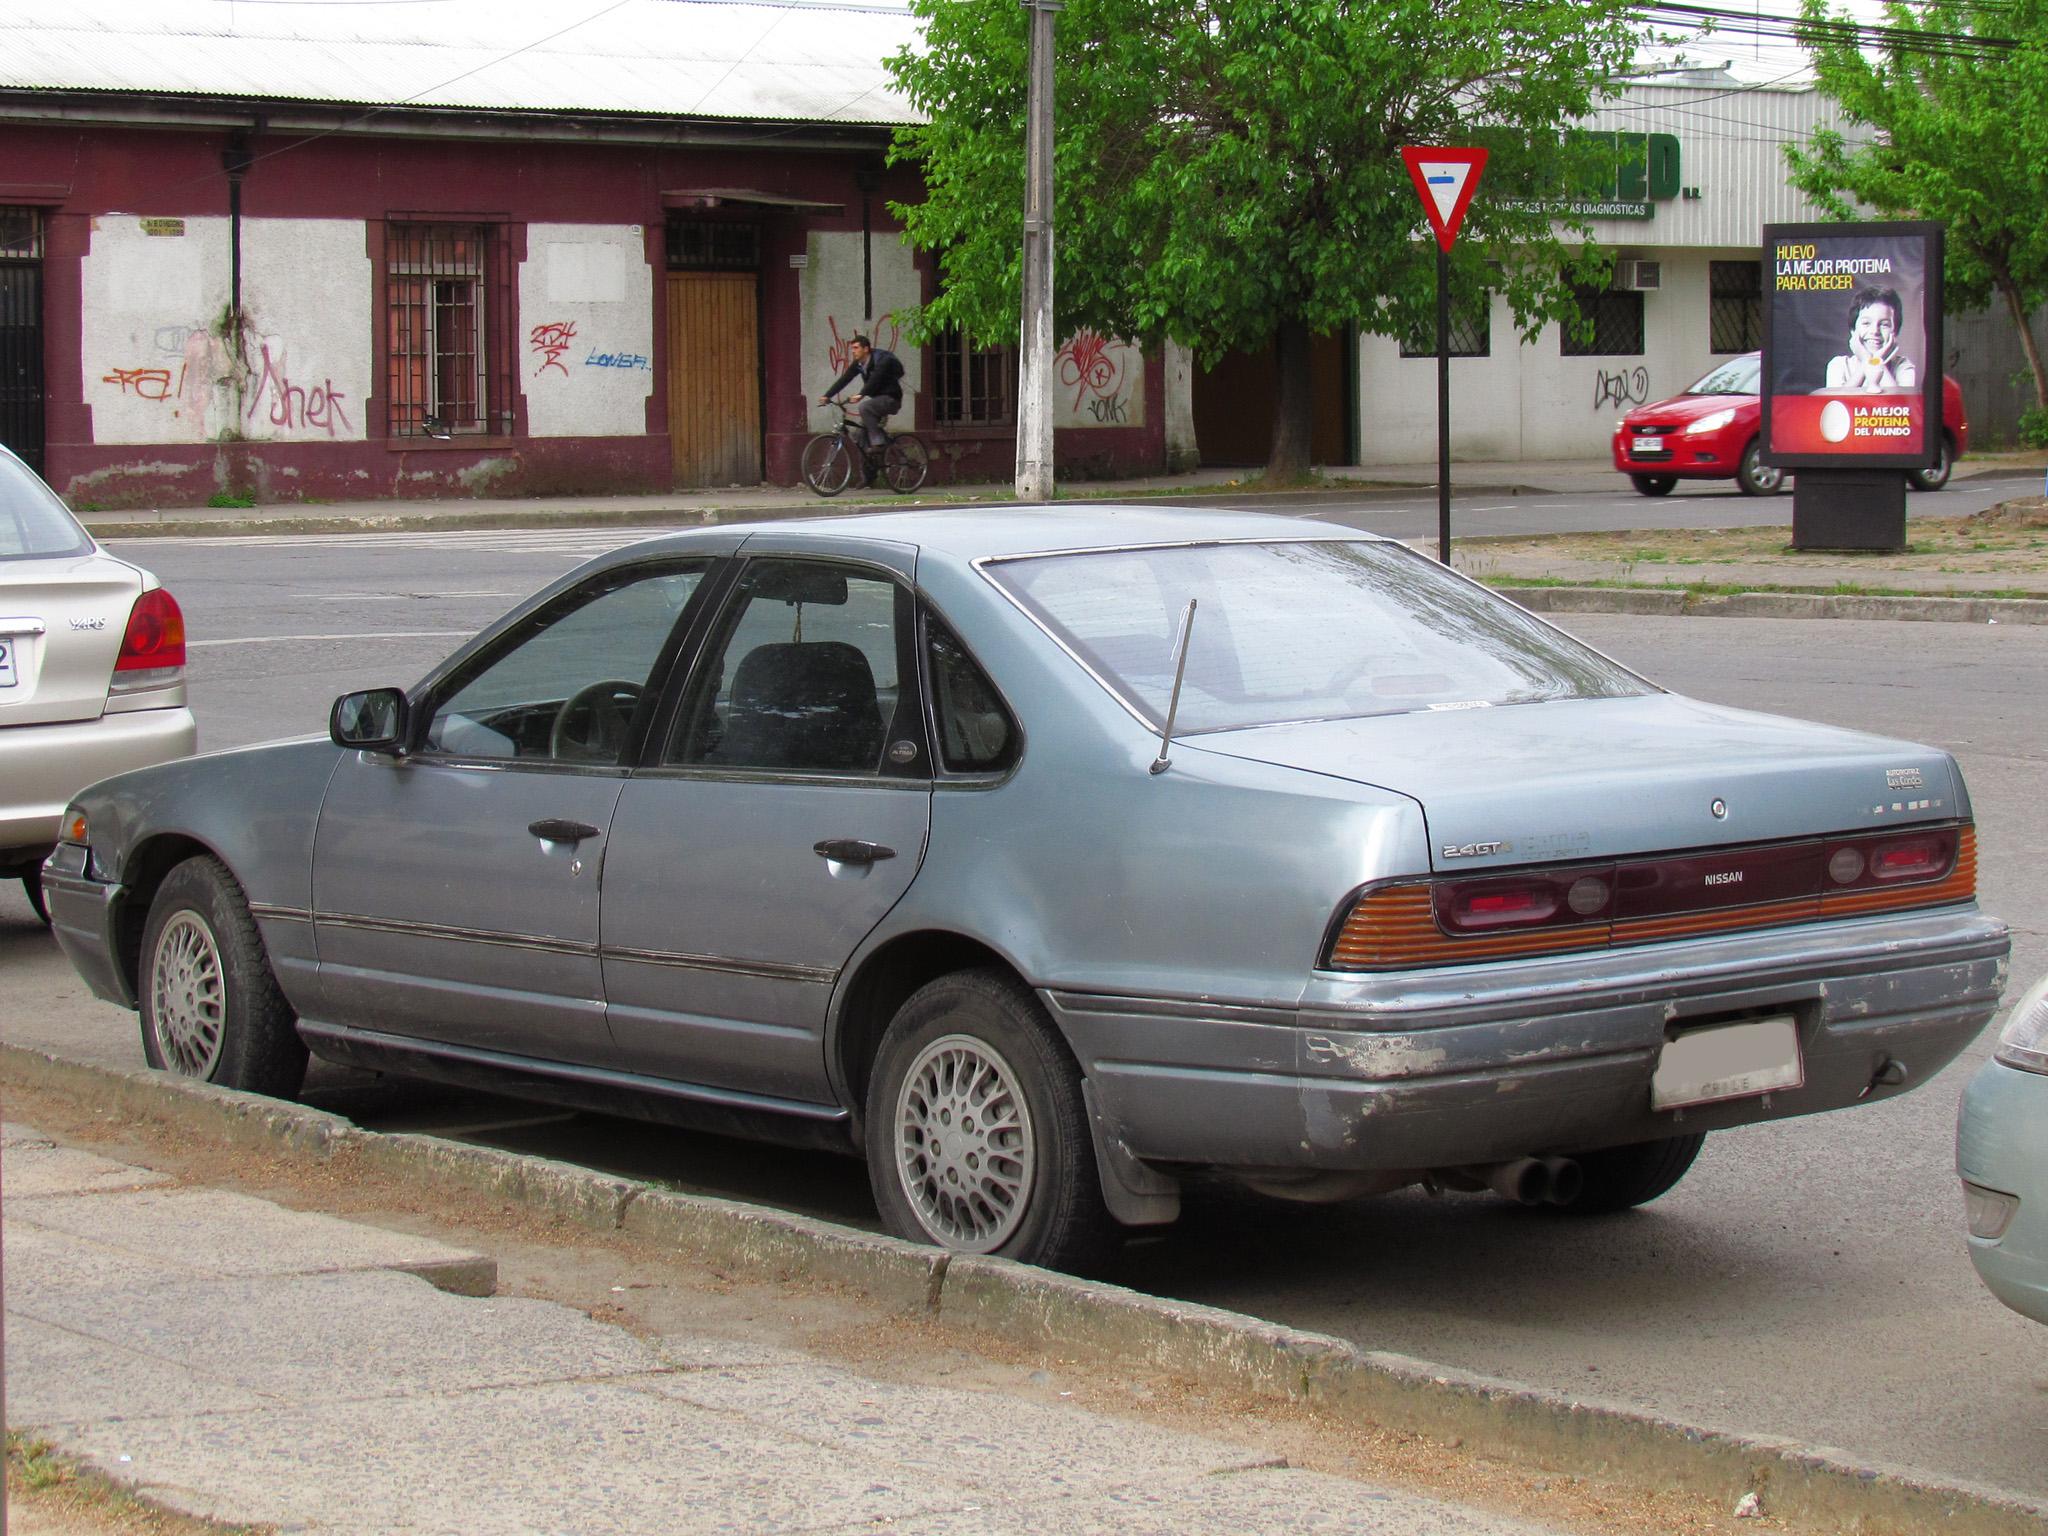 File:Nissan Laurel Altima 2.4 GTS 1991 (11125560895).jpg ...